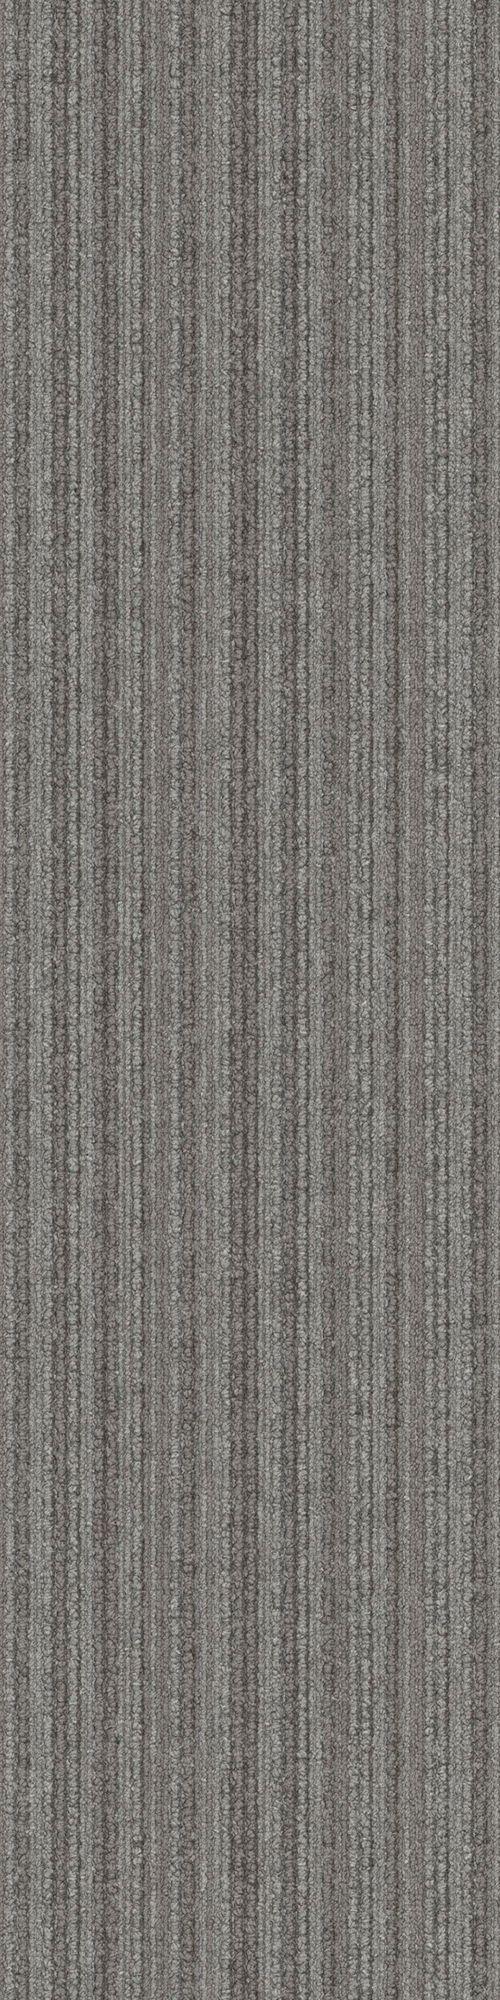 Interface carpet tile: SL910 Color name:Nickle